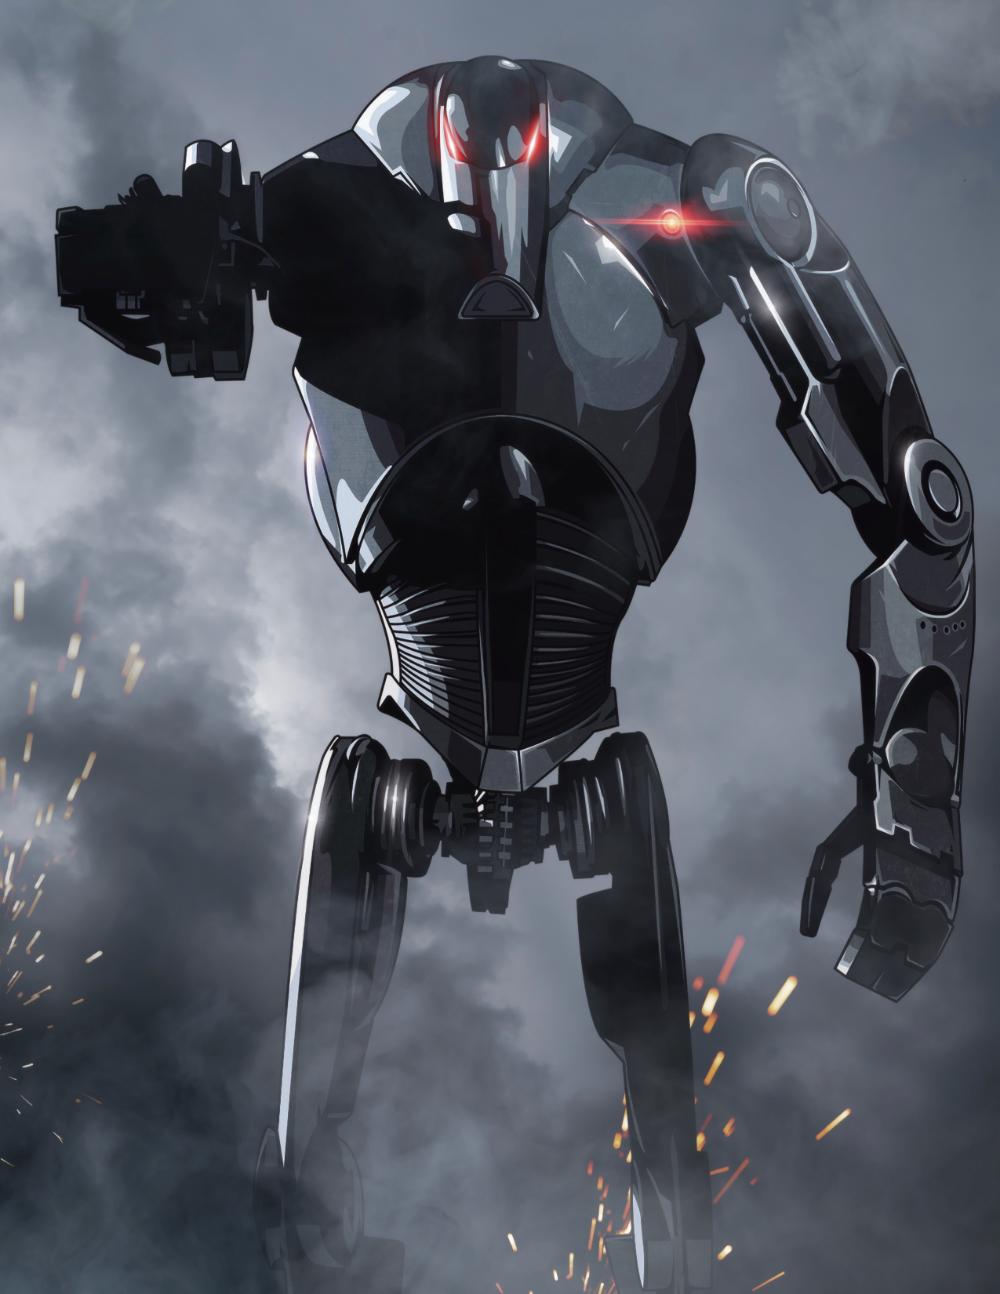 Super Scoundrel On Twitter Star Wars Background Star Wars Pictures Star Wars Images